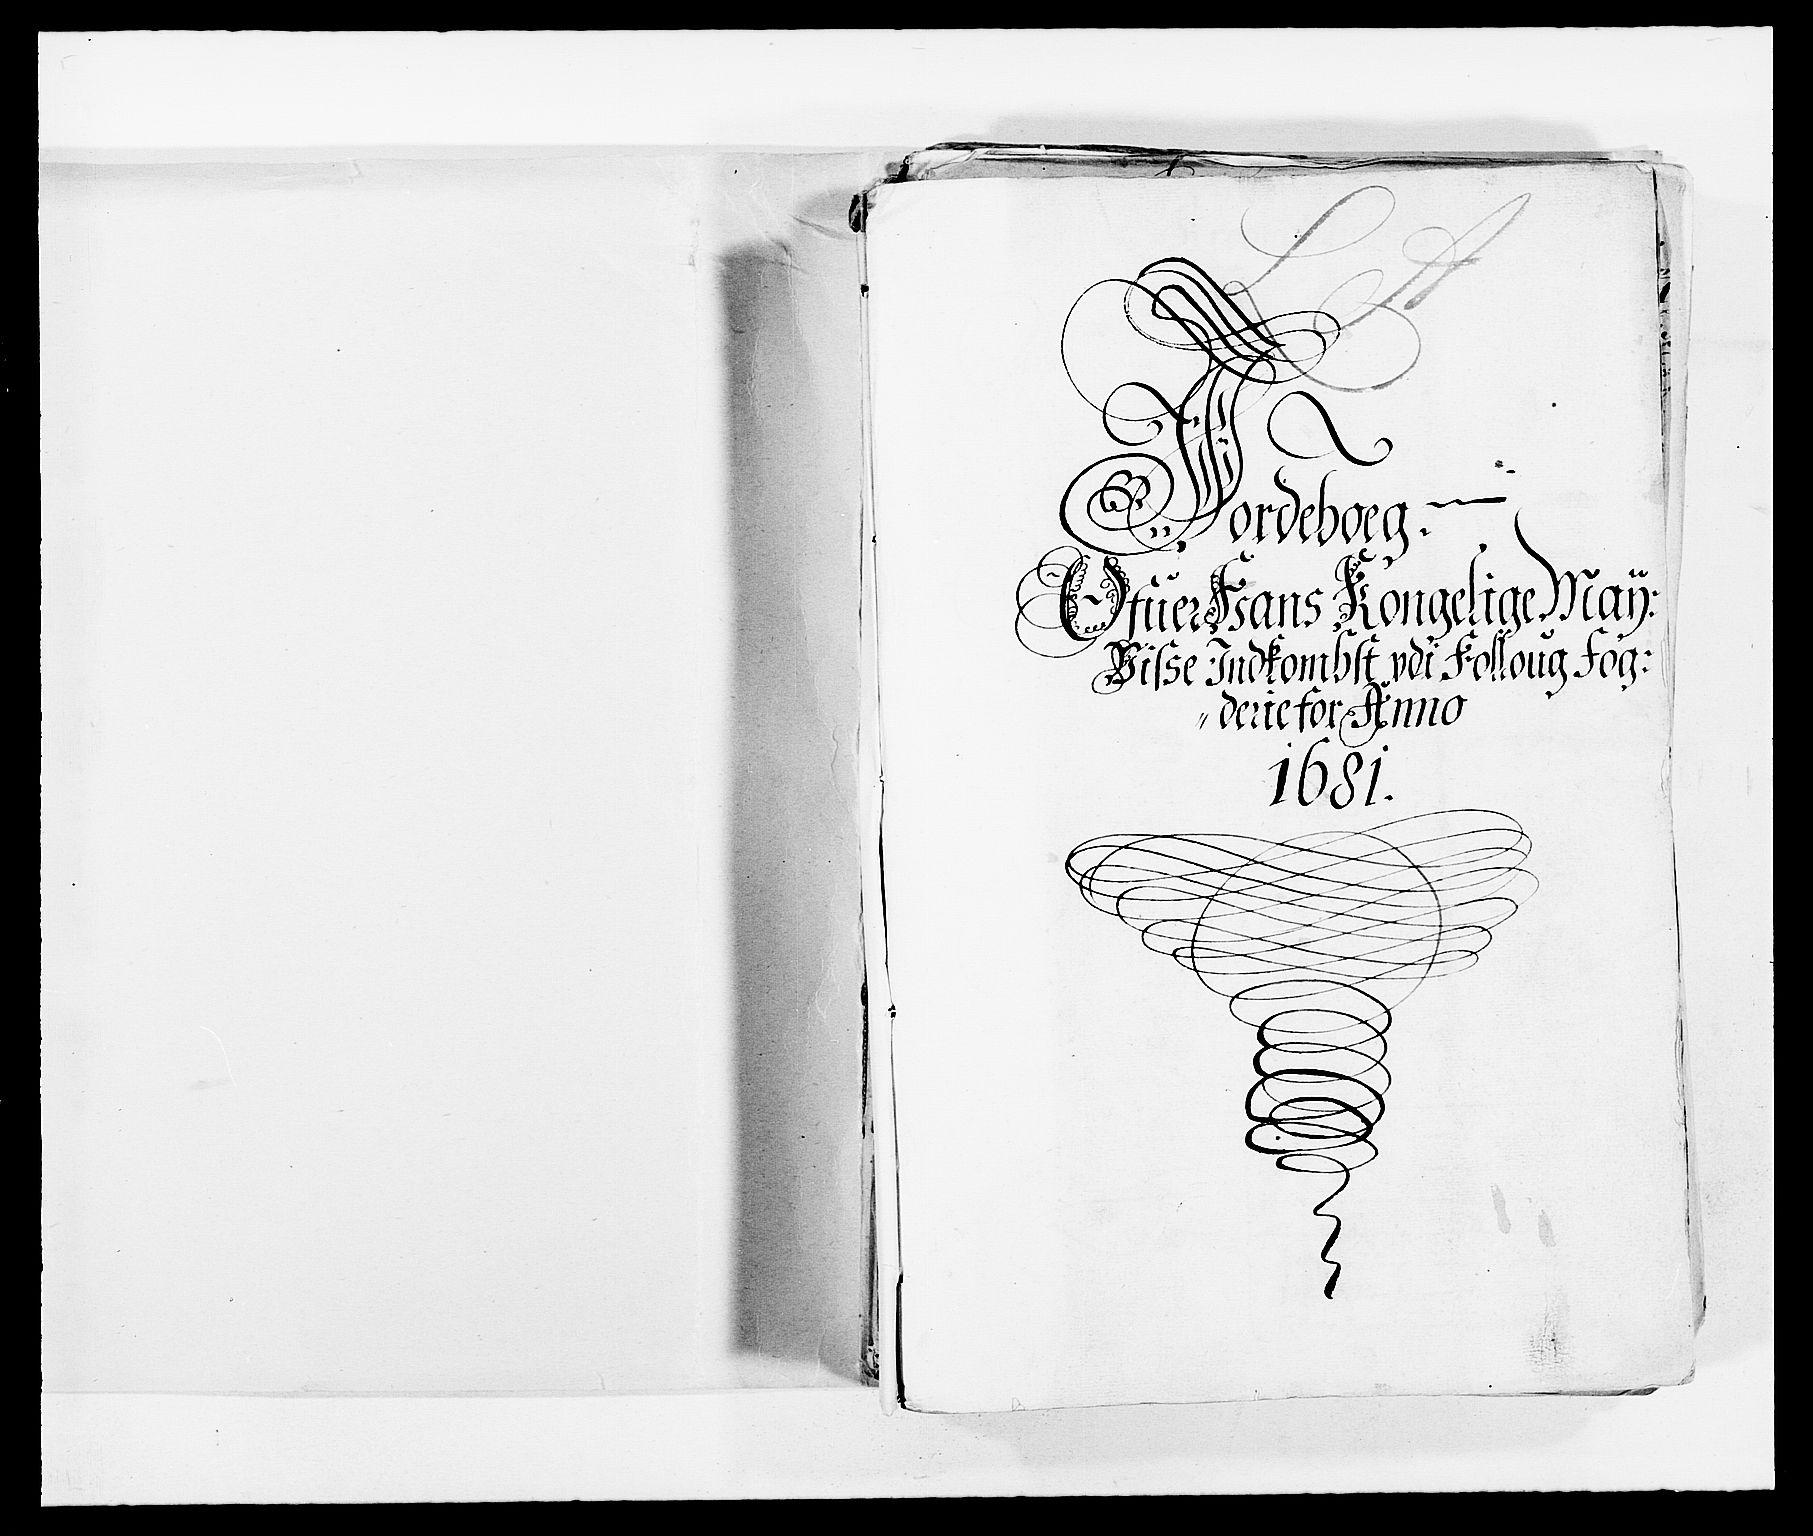 RA, Rentekammeret inntil 1814, Reviderte regnskaper, Fogderegnskap, R09/L0429: Fogderegnskap Follo, 1680-1681, s. 201